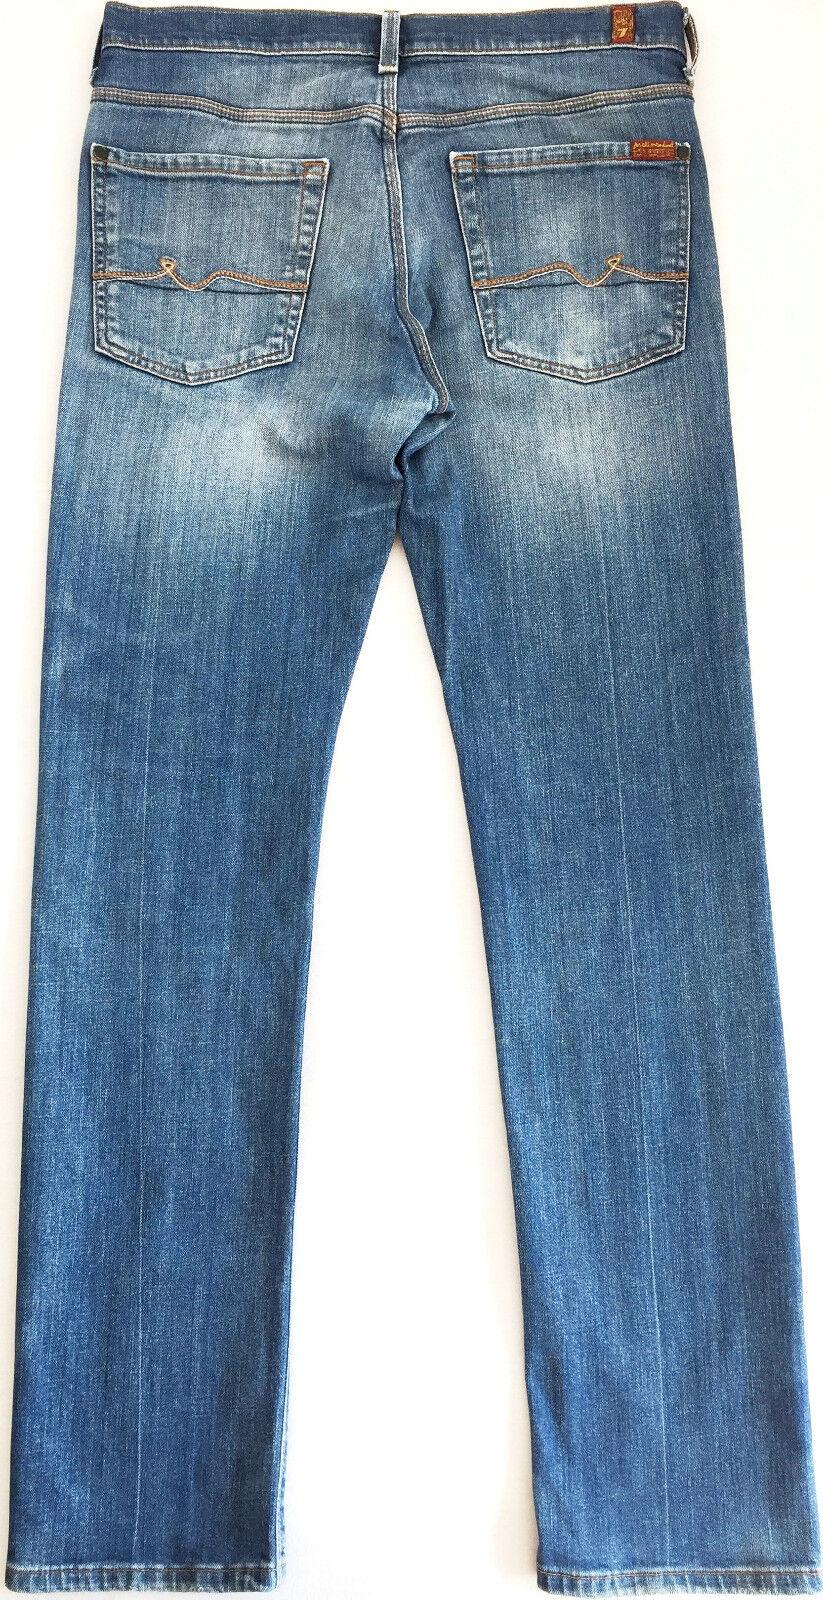 f0f9a6fd 7 FOR ALL Men SLIMMY Used Indigo Jeans Slim Fit Stretch W32 W33 L33 bluee  MANKIND nfhxiy5785-Jeans